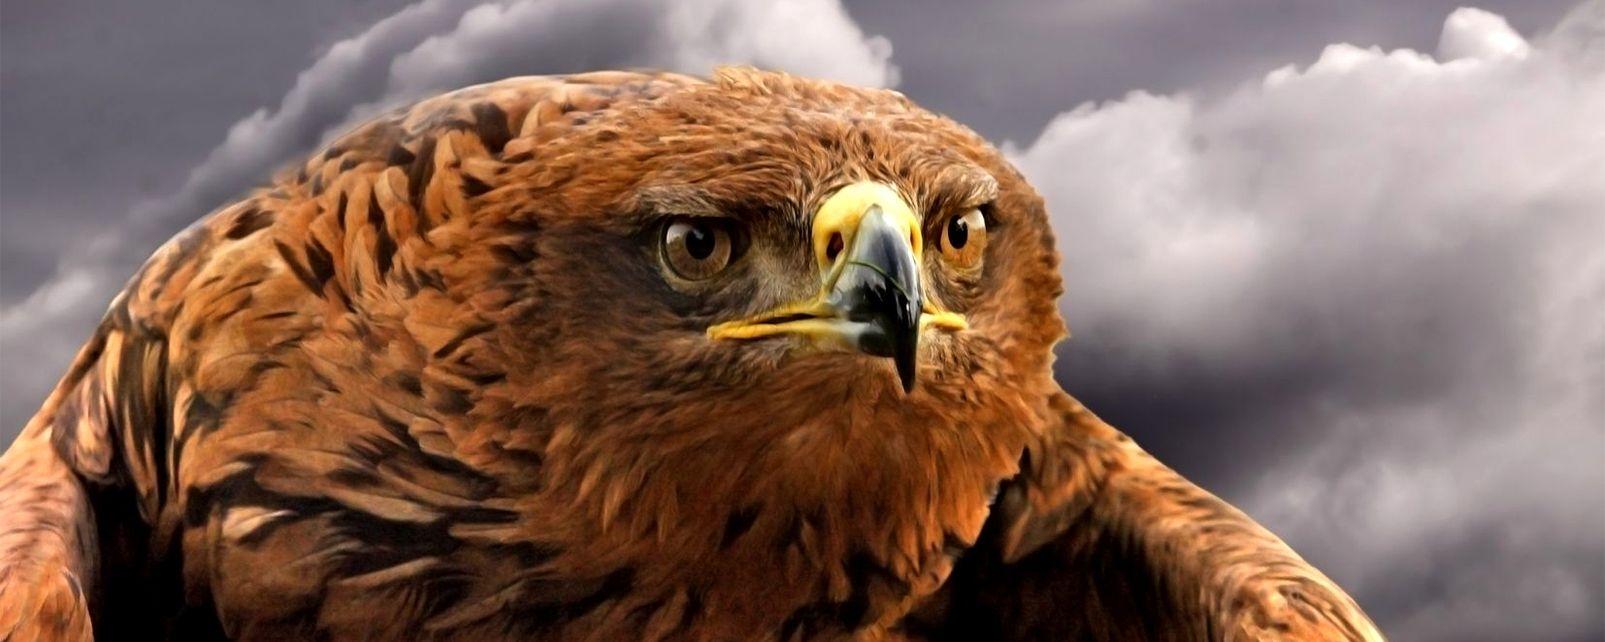 La faune et la flore, espagne, andalousie, europe, aigle, animal, faune, oiseau